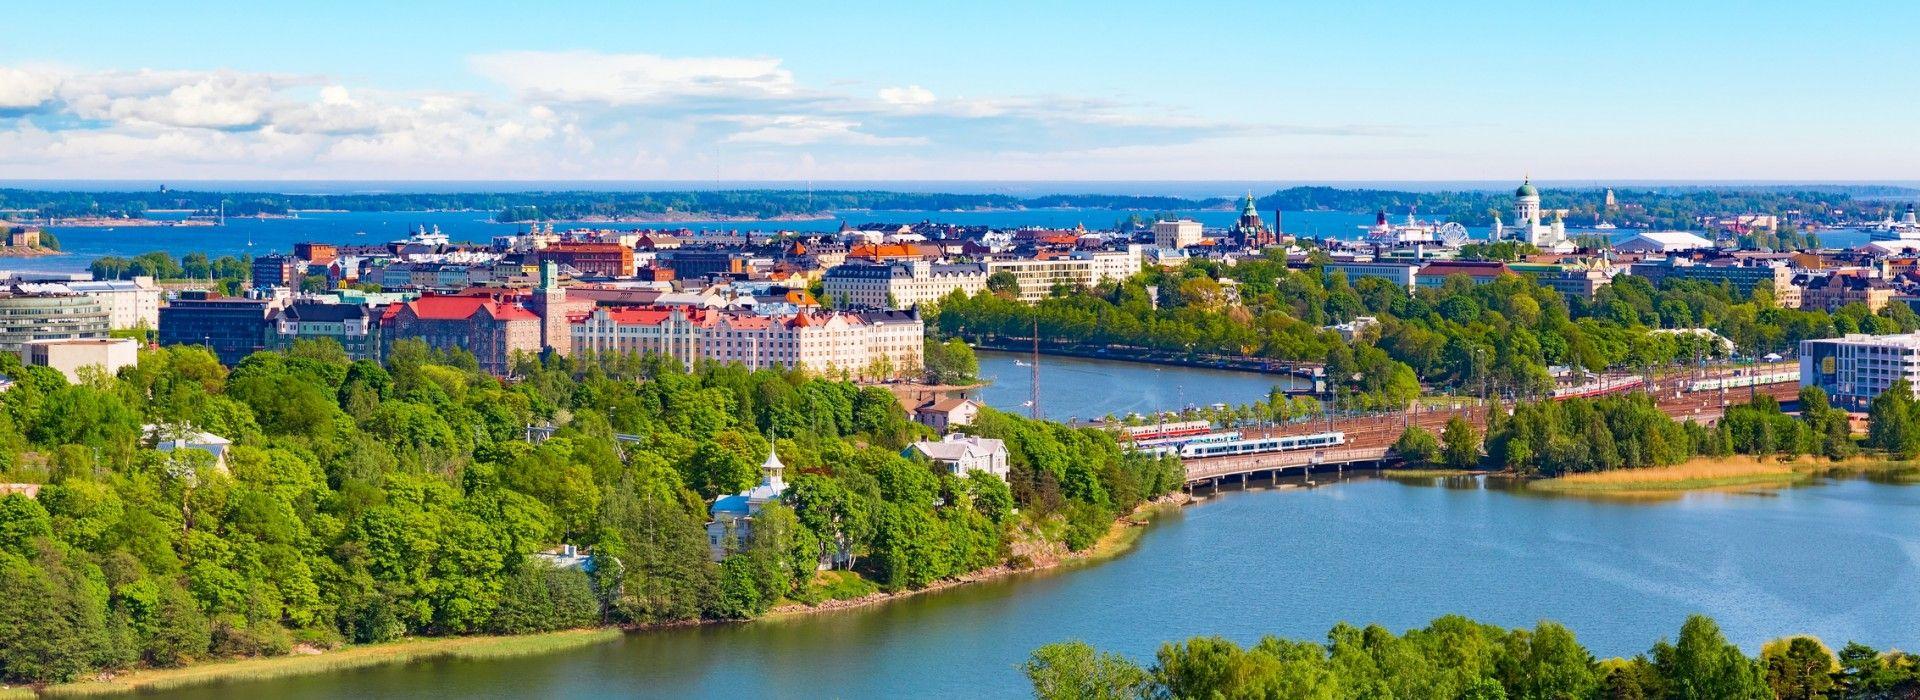 Northern lights tours in Helsinki